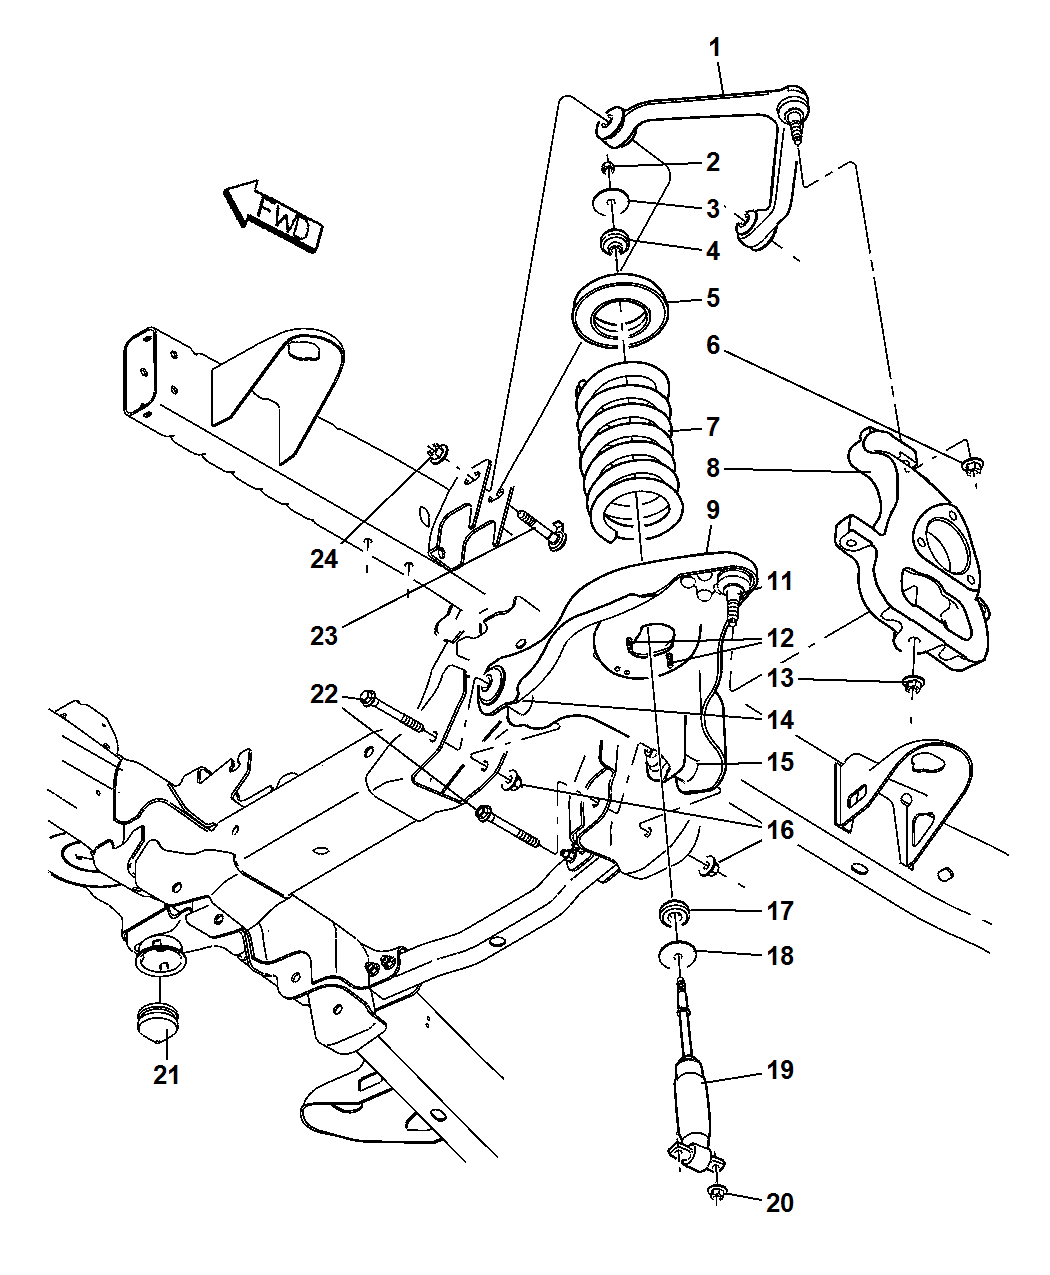 Dodge Ram Steering Parts Diagram